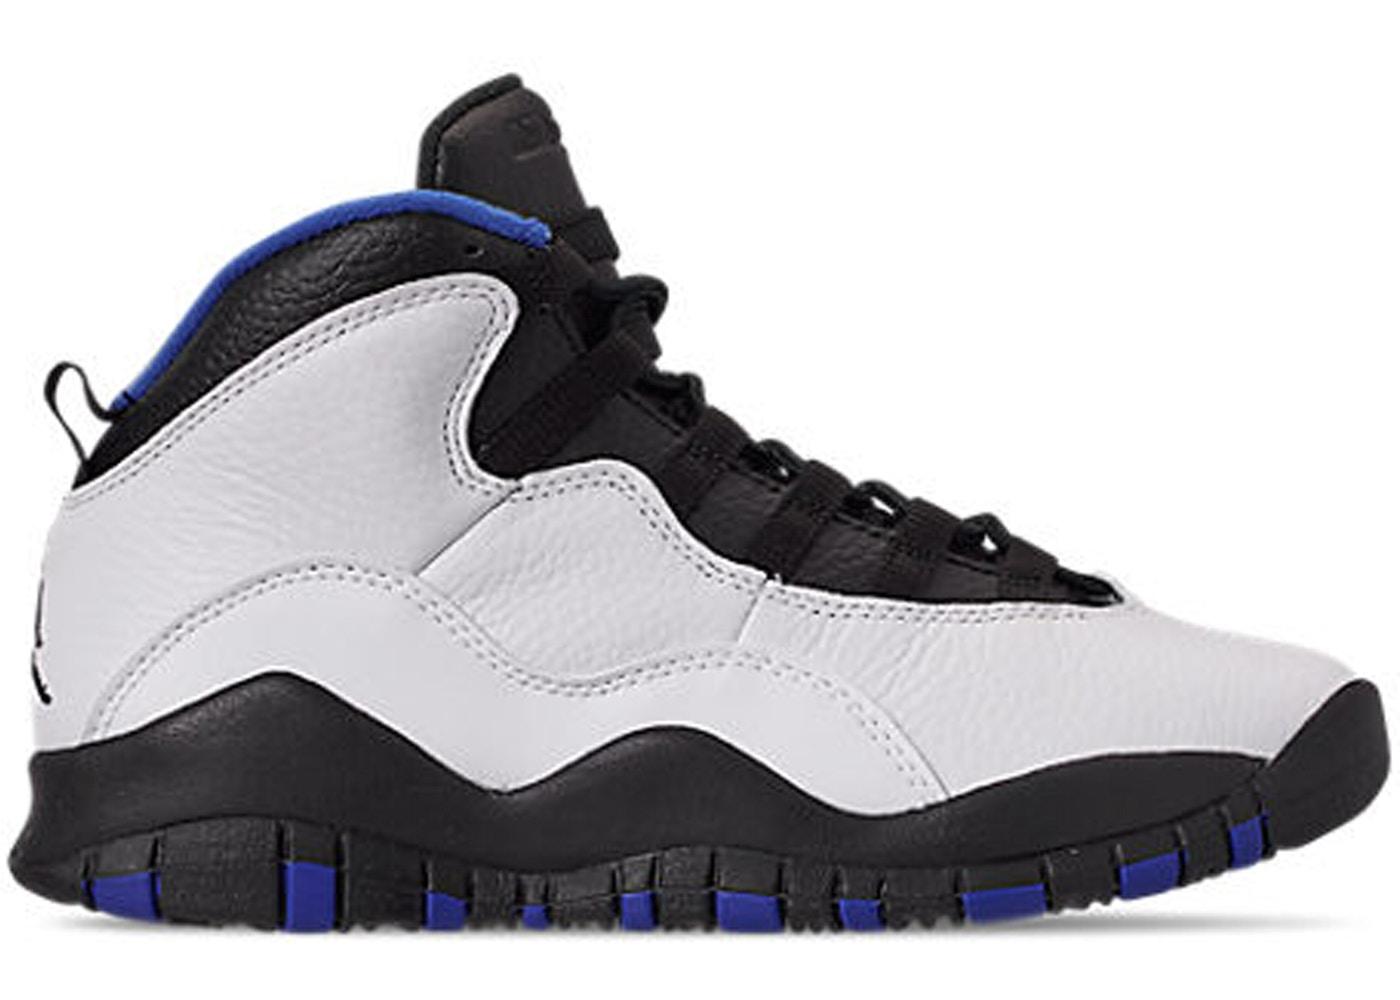 7b7d58fee69 Buy Air Jordan 10 Shoes & Deadstock Sneakers